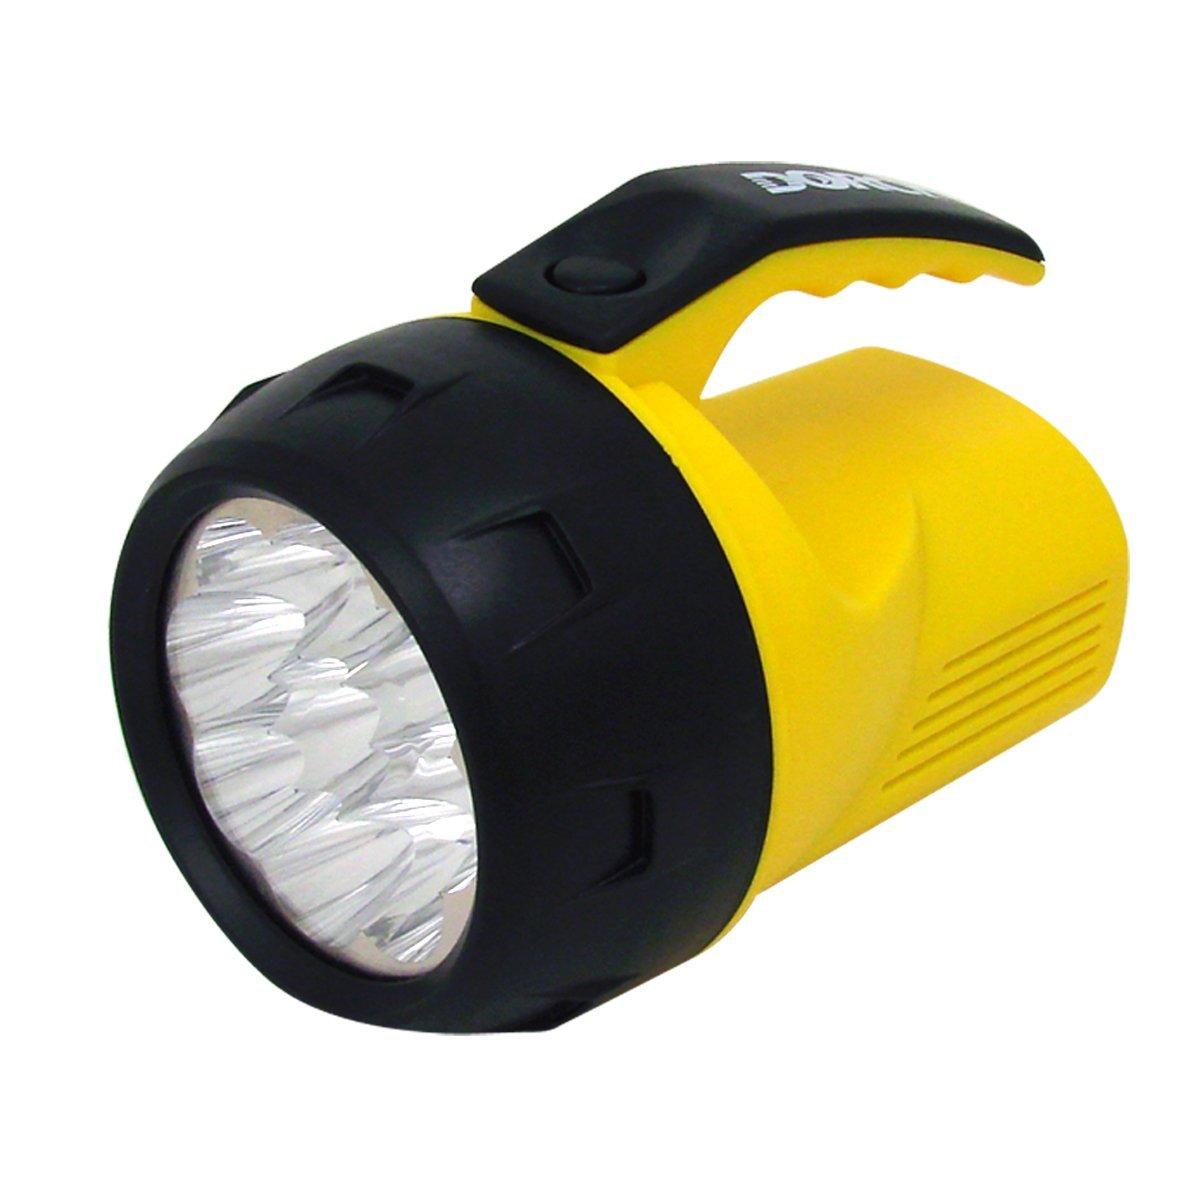 1200x1200 Flashlight Elf Clip Art Image